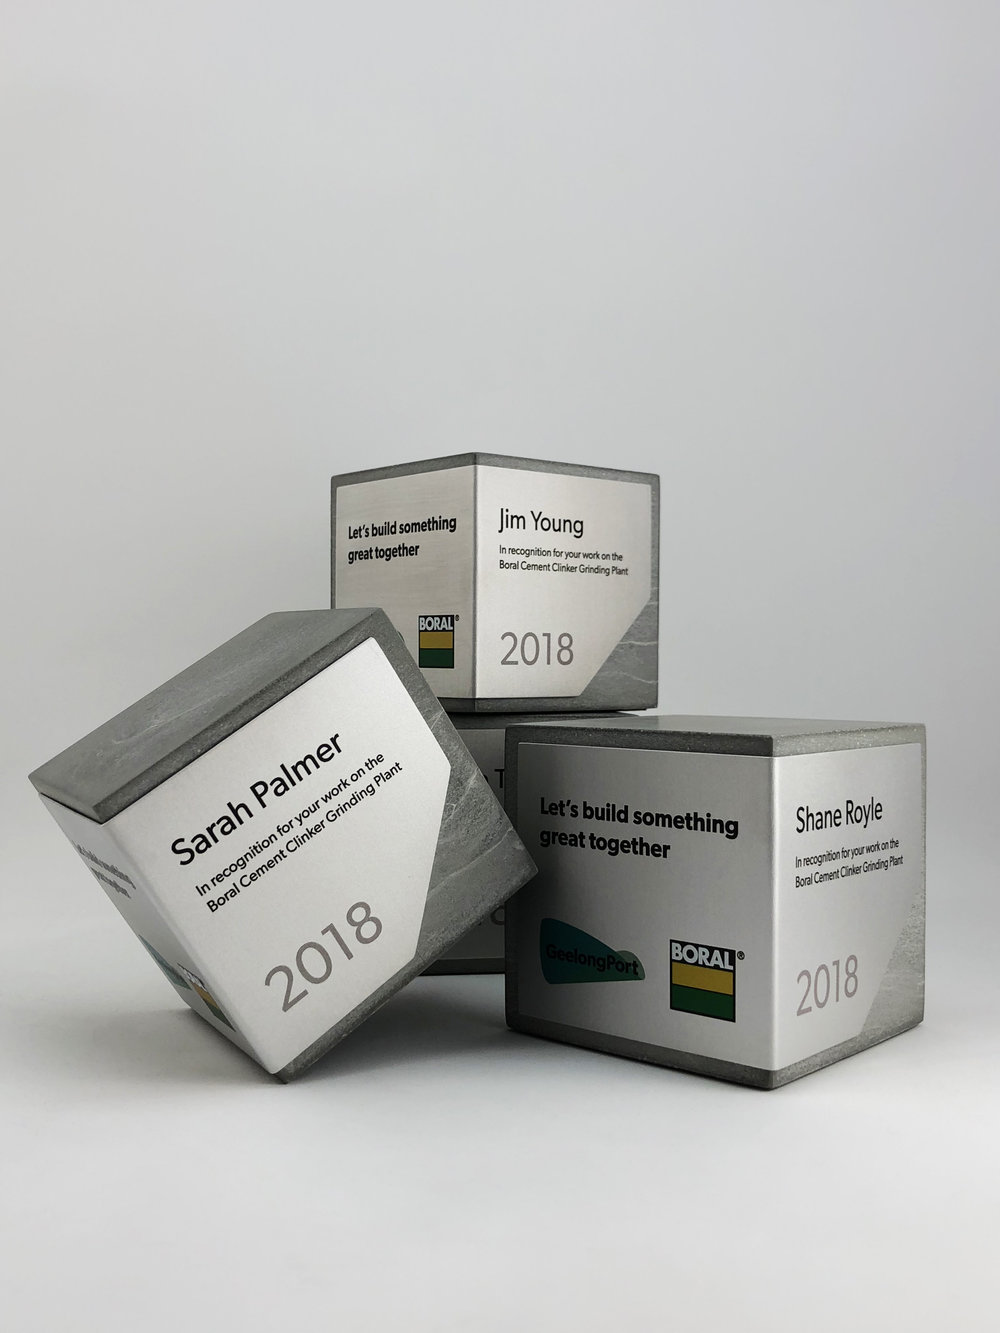 geelong-port-cement-cube-awards-trophy-07.jpg